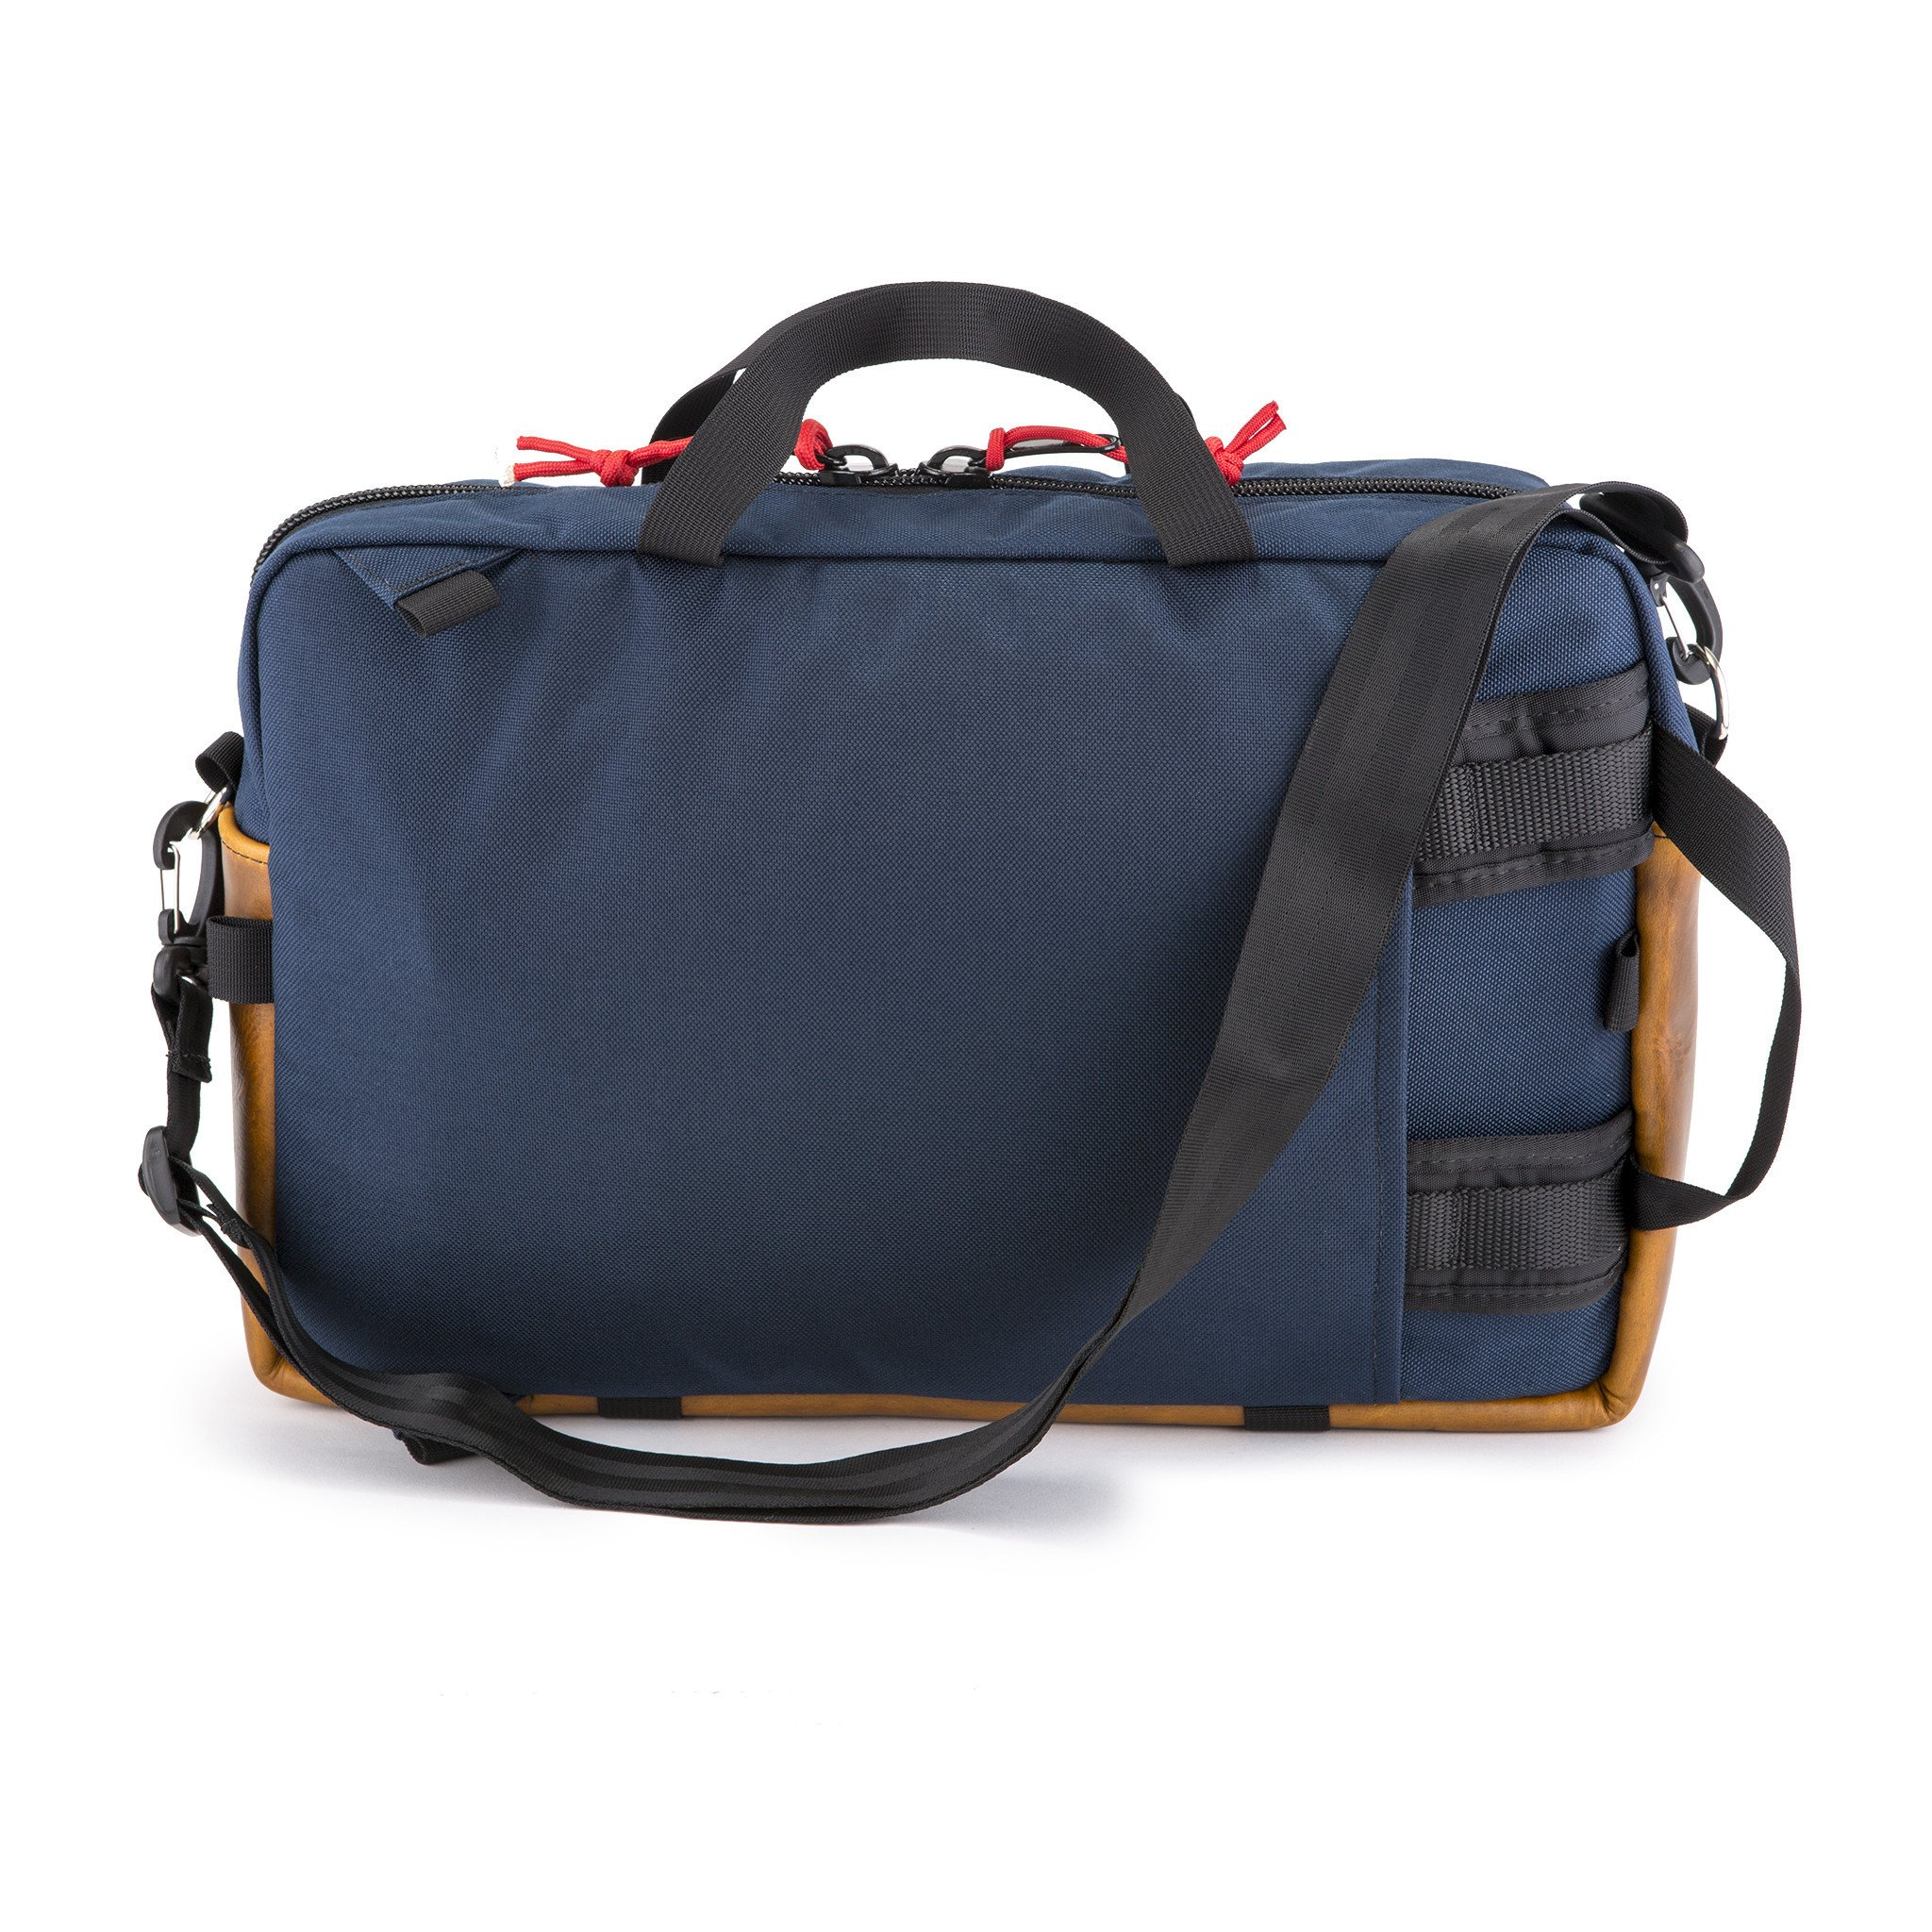 bags-mountain-briefcase-7_2048x2048.jpg